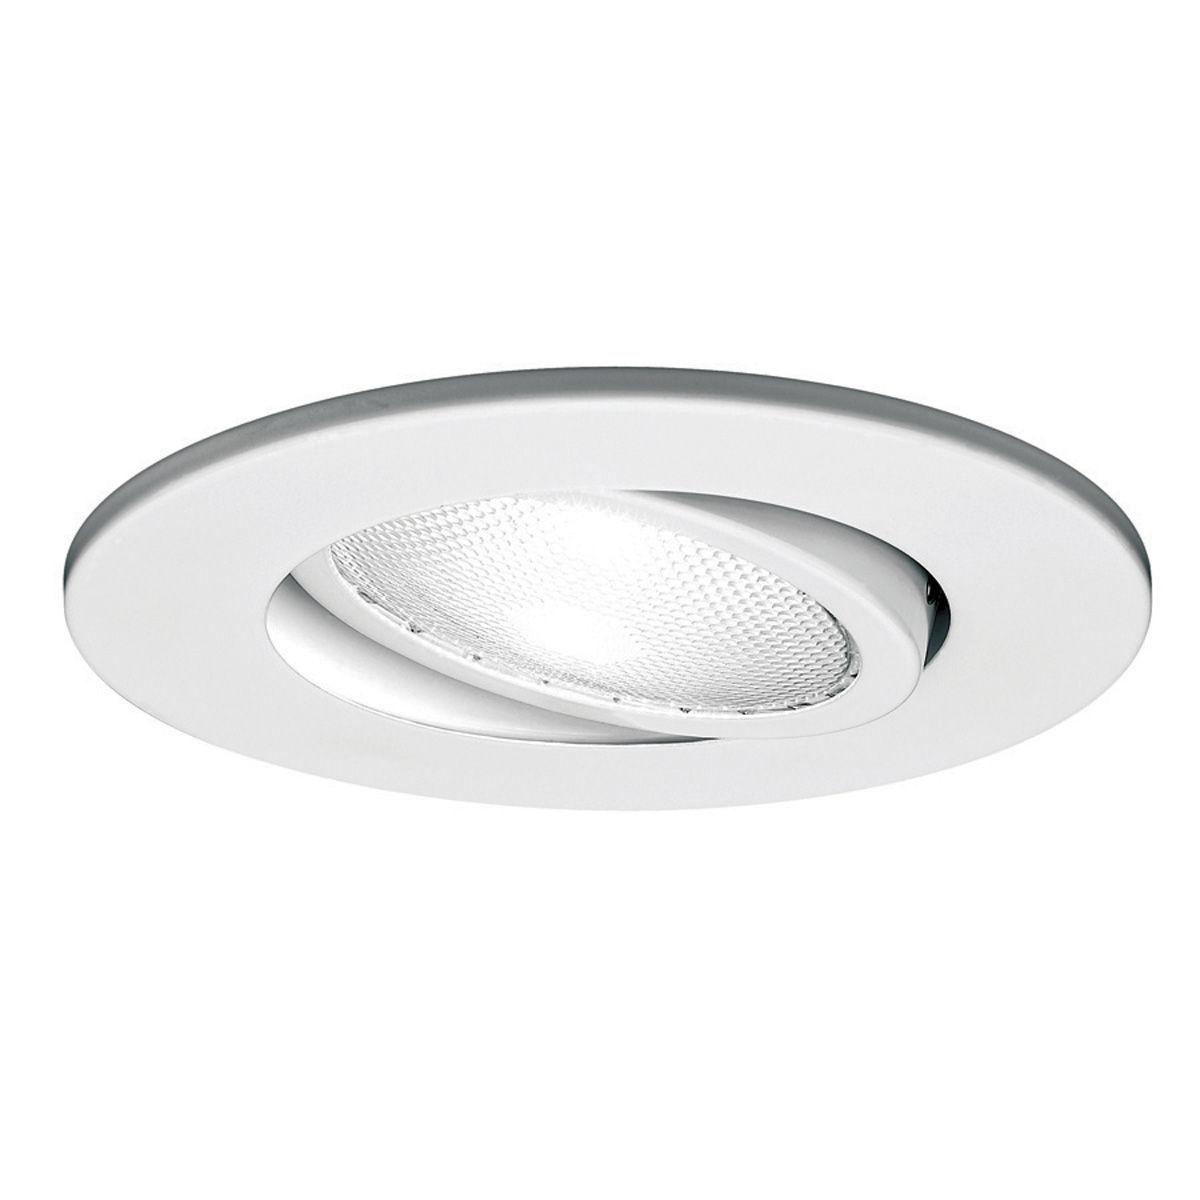 10 Reasons To Install Recessed Halogen Ceiling Lights Warisan Lighting